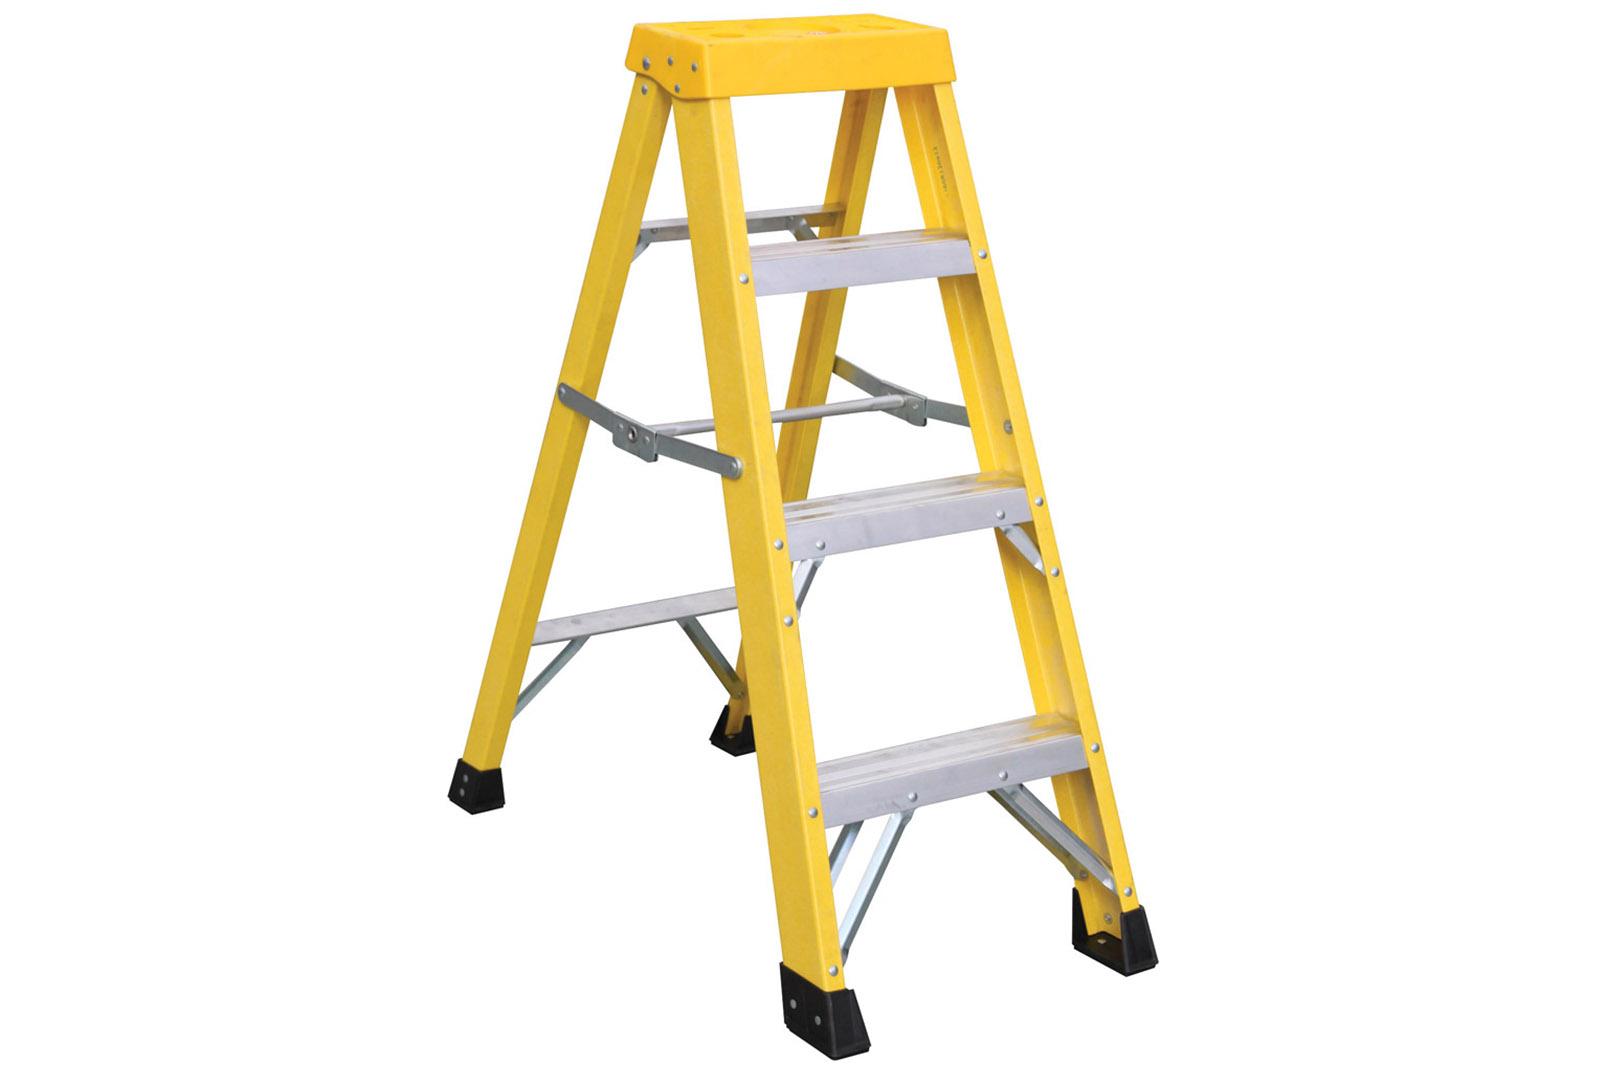 Win a Draper Fibreglass Ladder